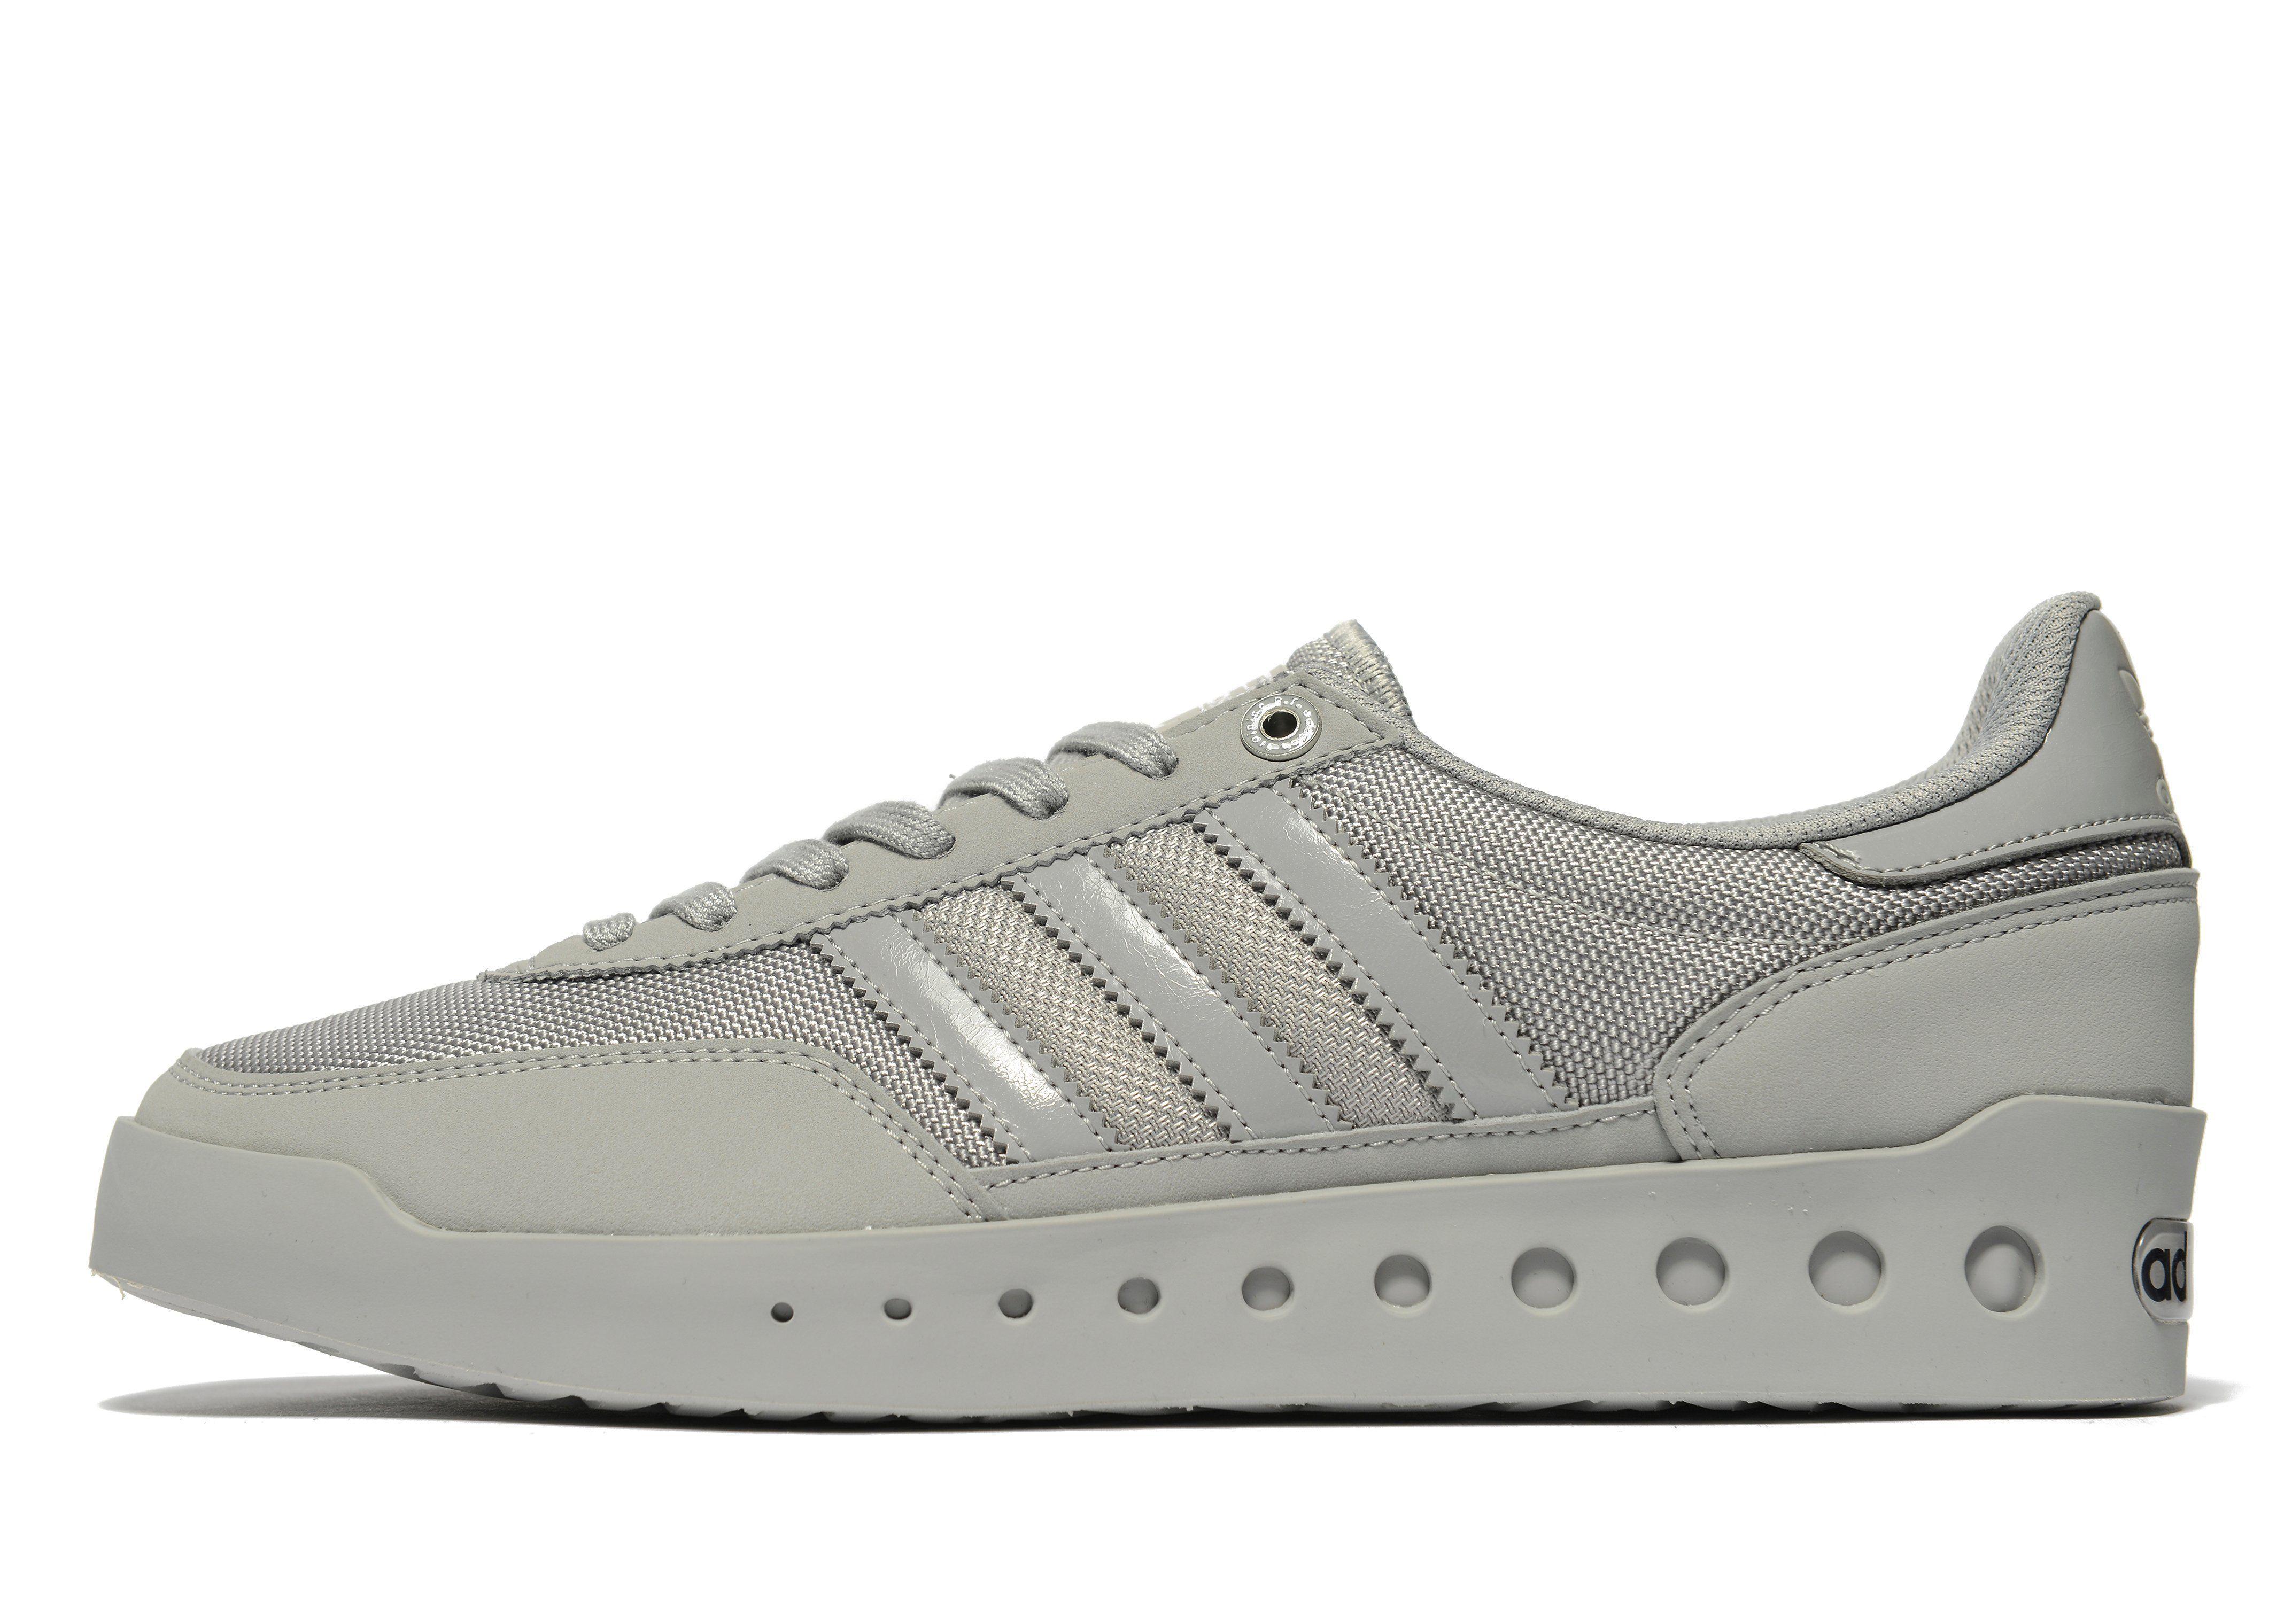 jd sports mens adidas originals trainers